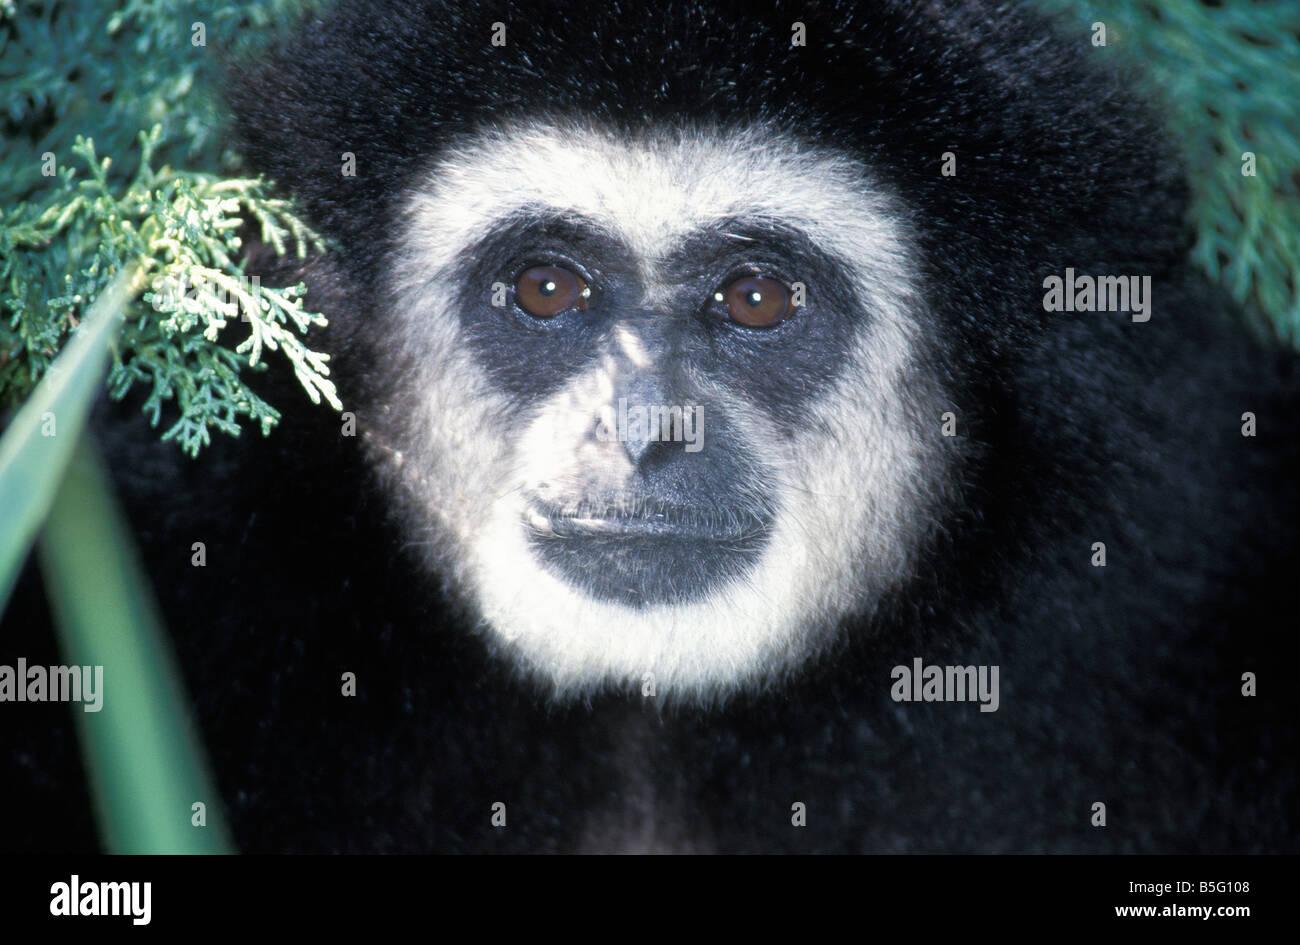 gibbon Lar Gibbon Hylobates concolor zoology animals mammal mammalian monkeys Lar Gibbon Hylobates concolor sitting - Stock Image